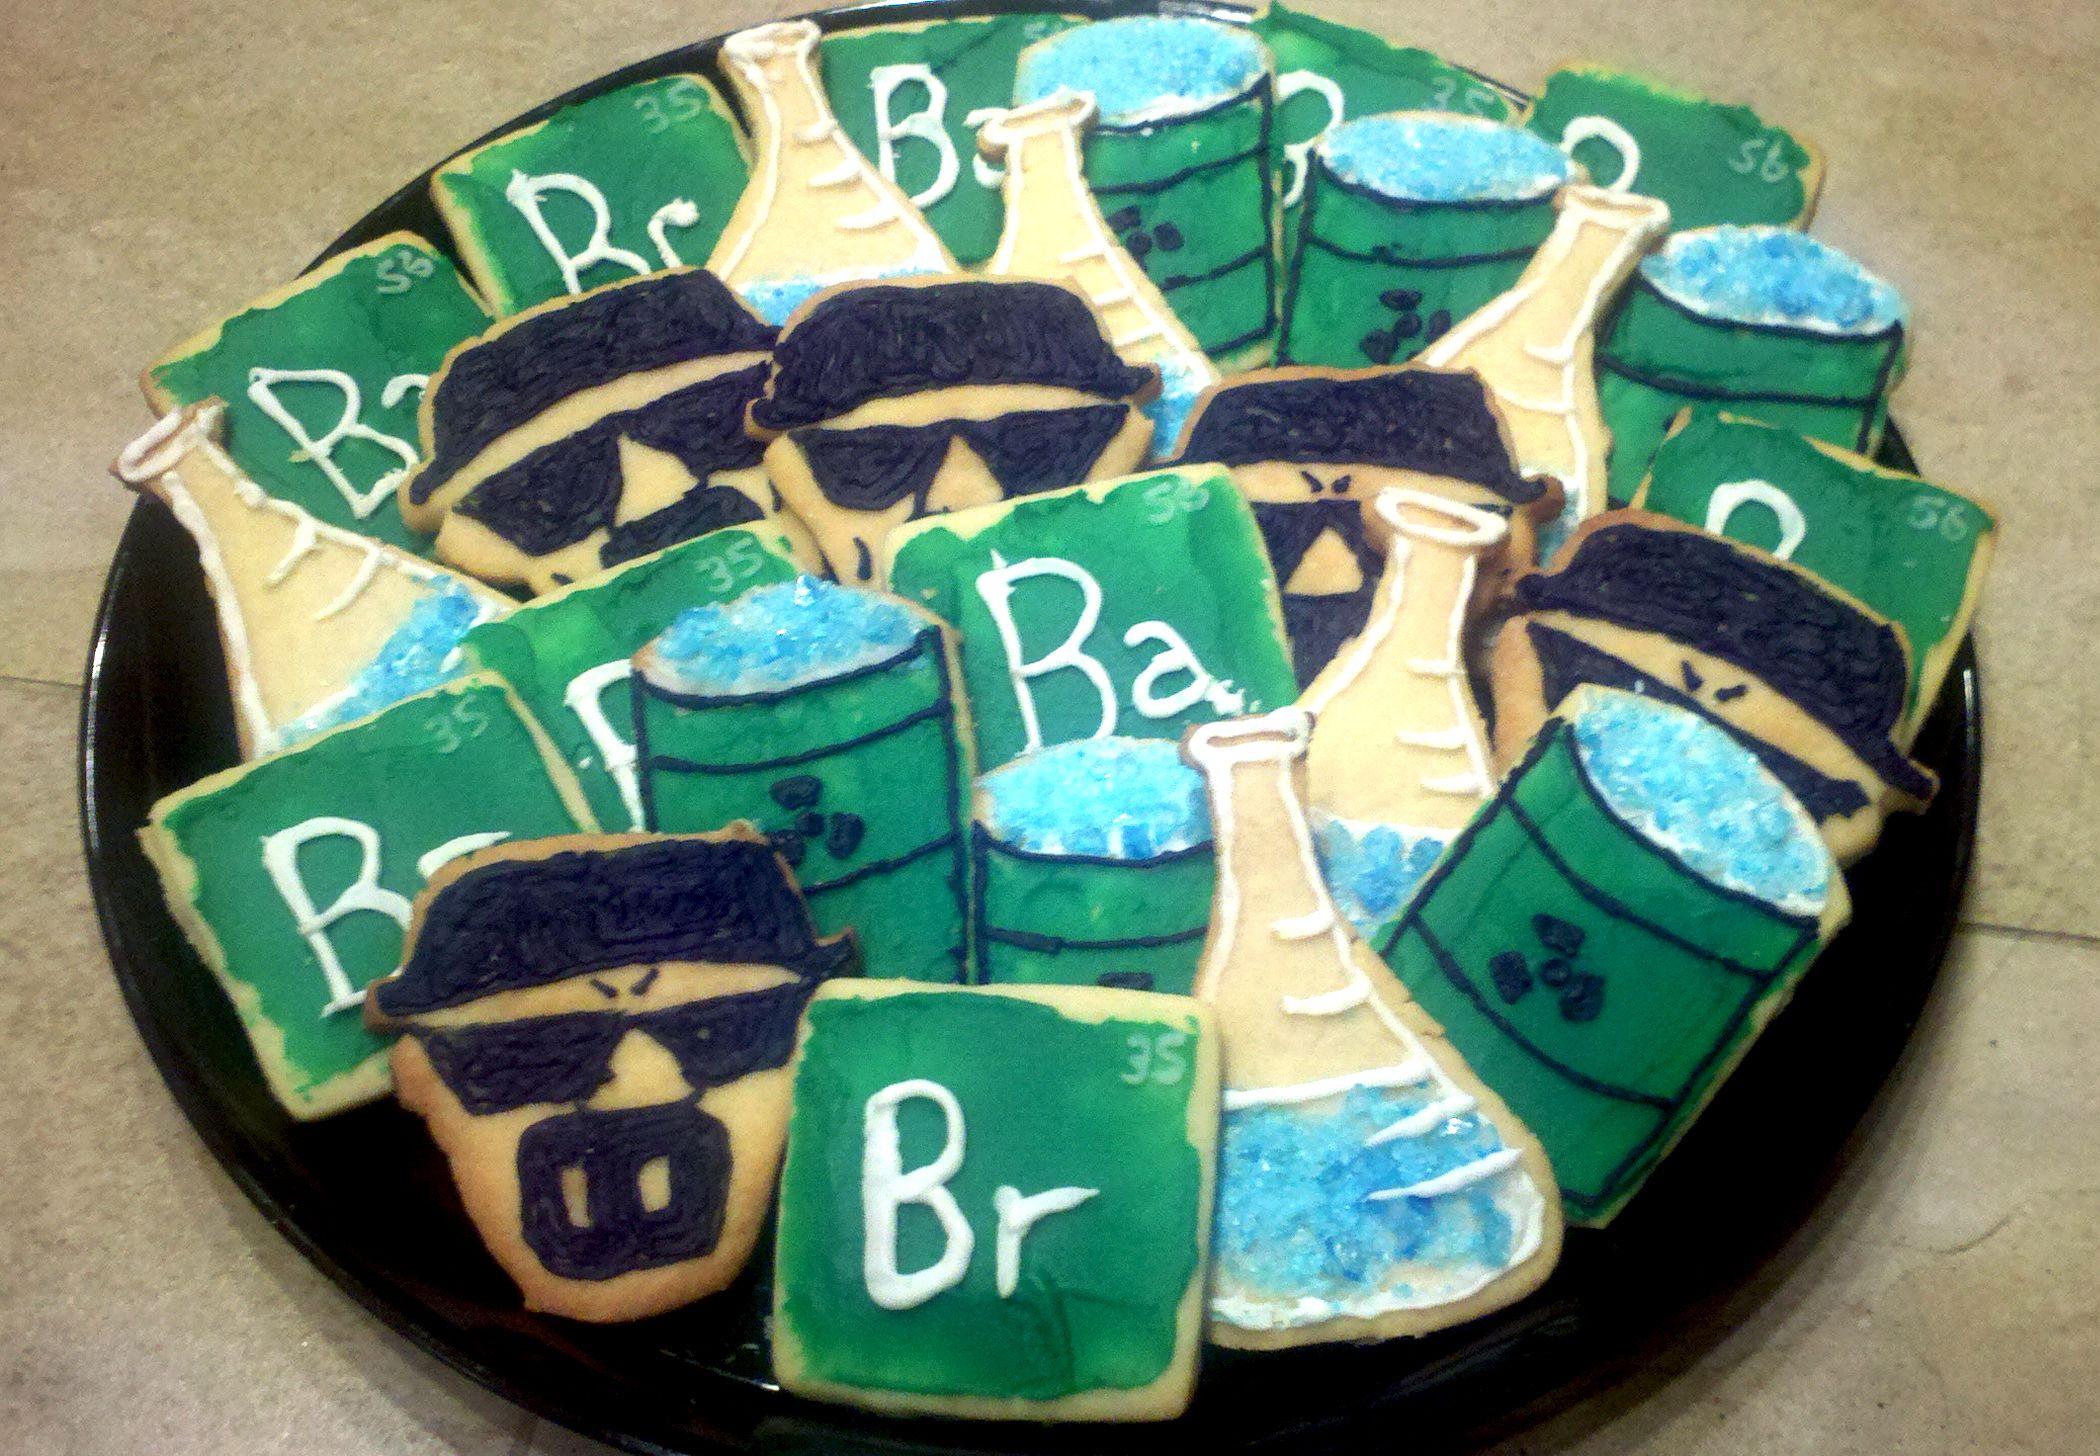 Homemade Breaking Bad cookies for the Breaking Bad Series Finale